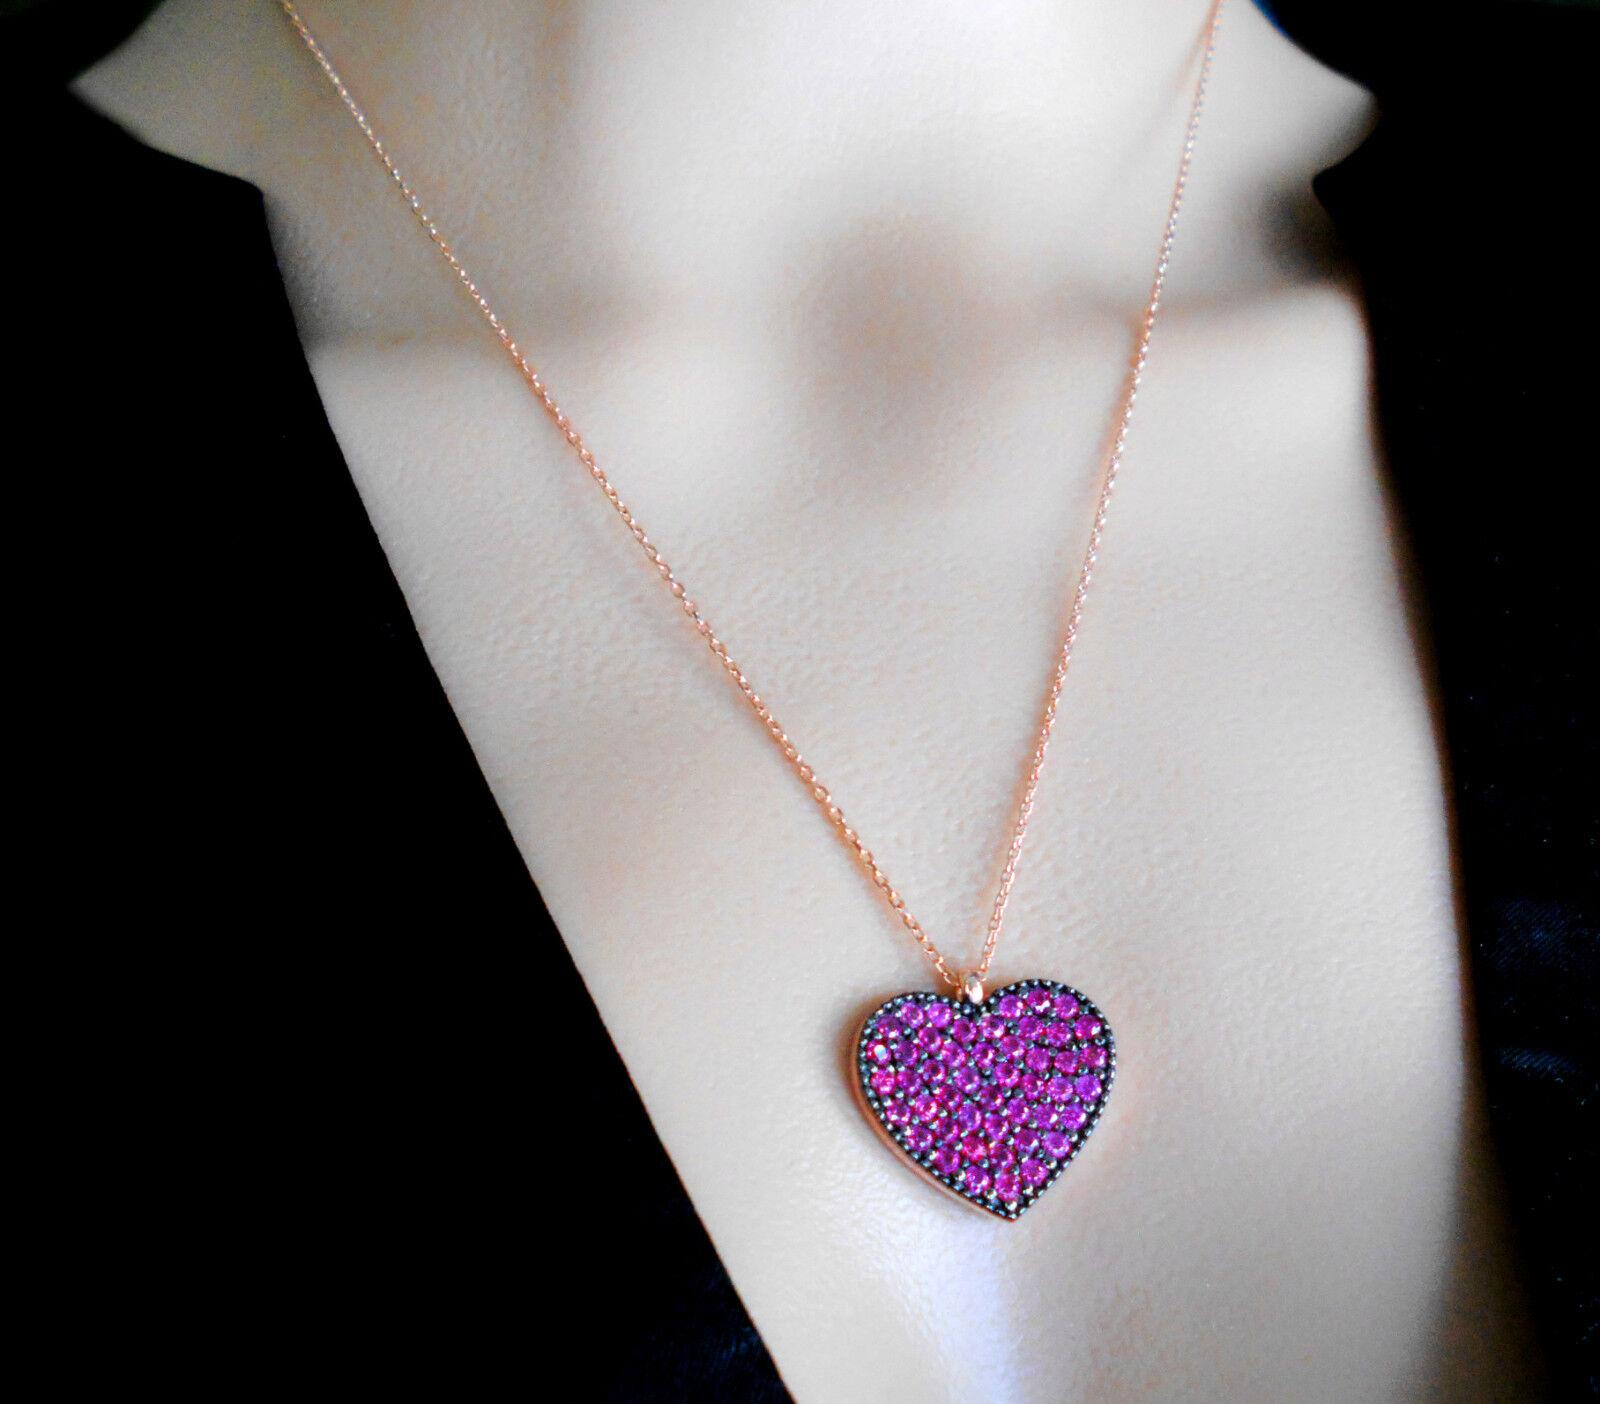 Cuore Cuore Cuore Collier STERLING argentoO Roséveroroet rosa pietre circa 52 lungo kur16 b25649